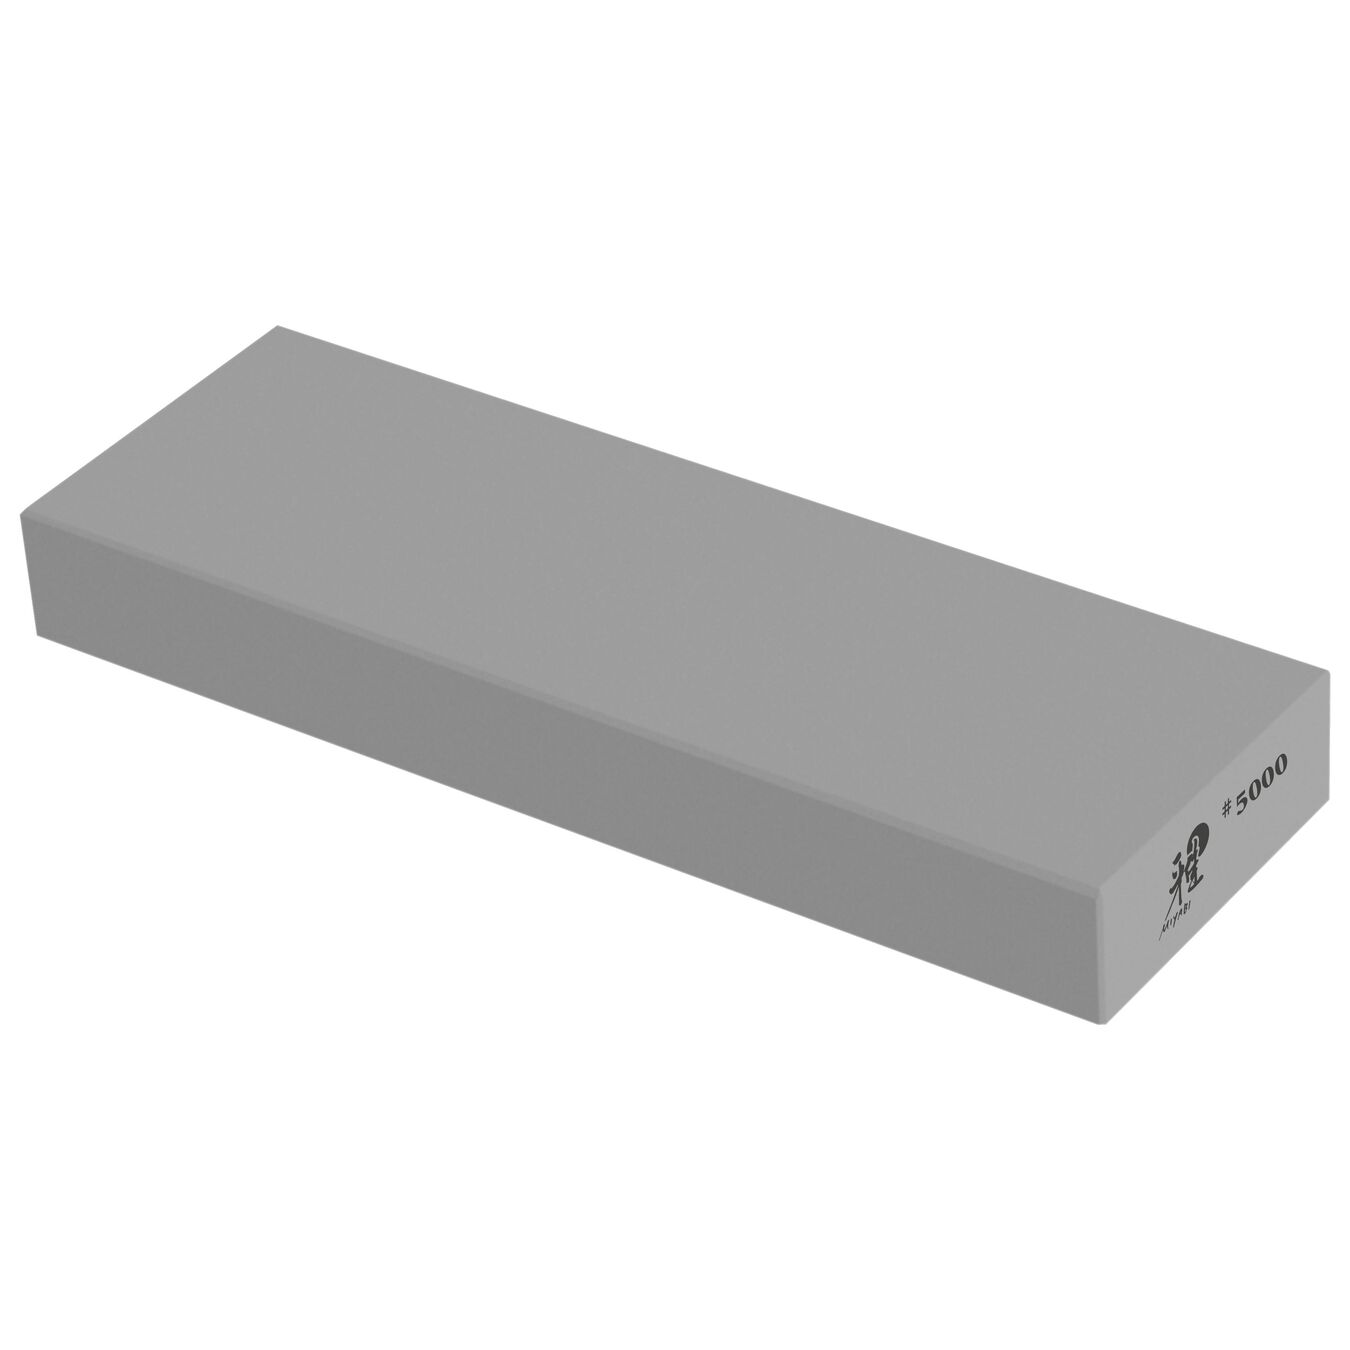 Pietra per affilare - 21 cm, ossido di alluminio, Grigia,,large 1